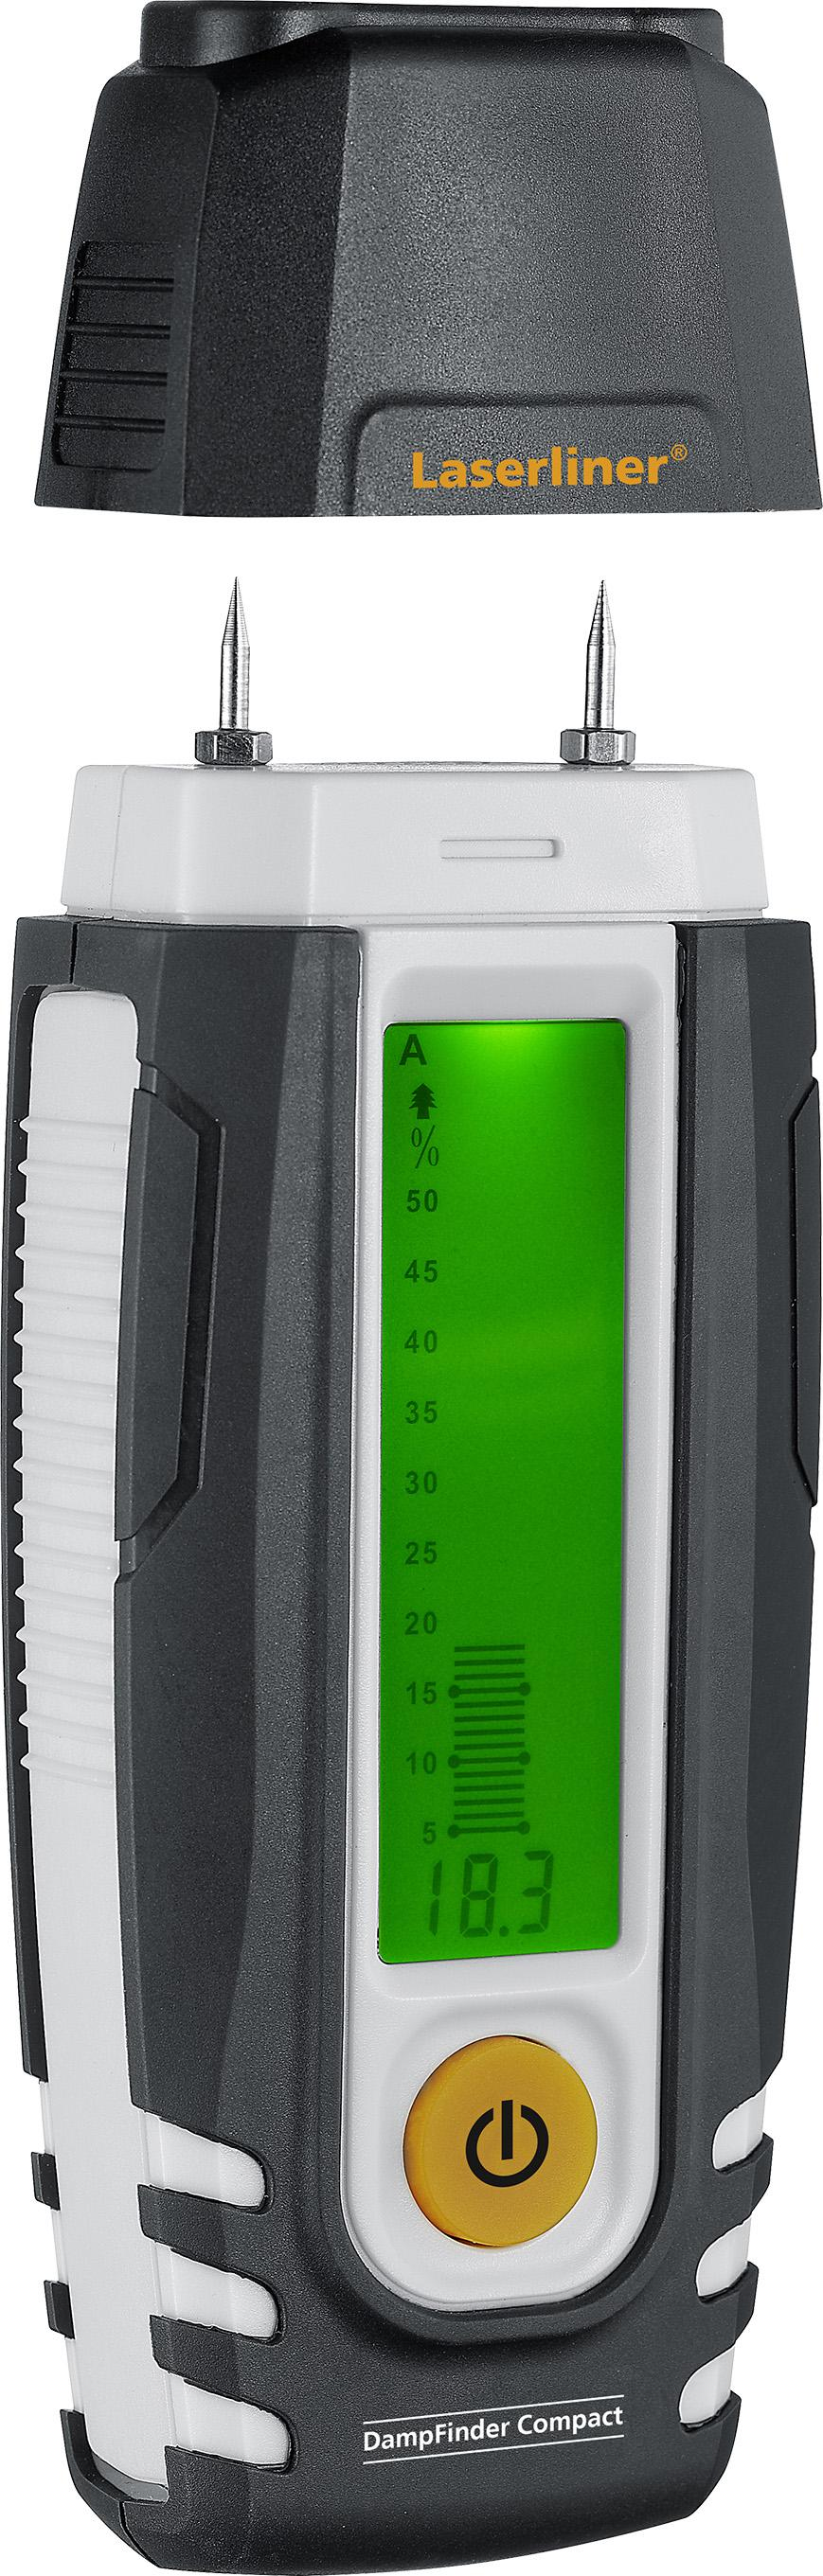 Влагомер Laserliner Dampfinder compact 082.015a влагомер kwb 0121 00 древесина стройматериалы